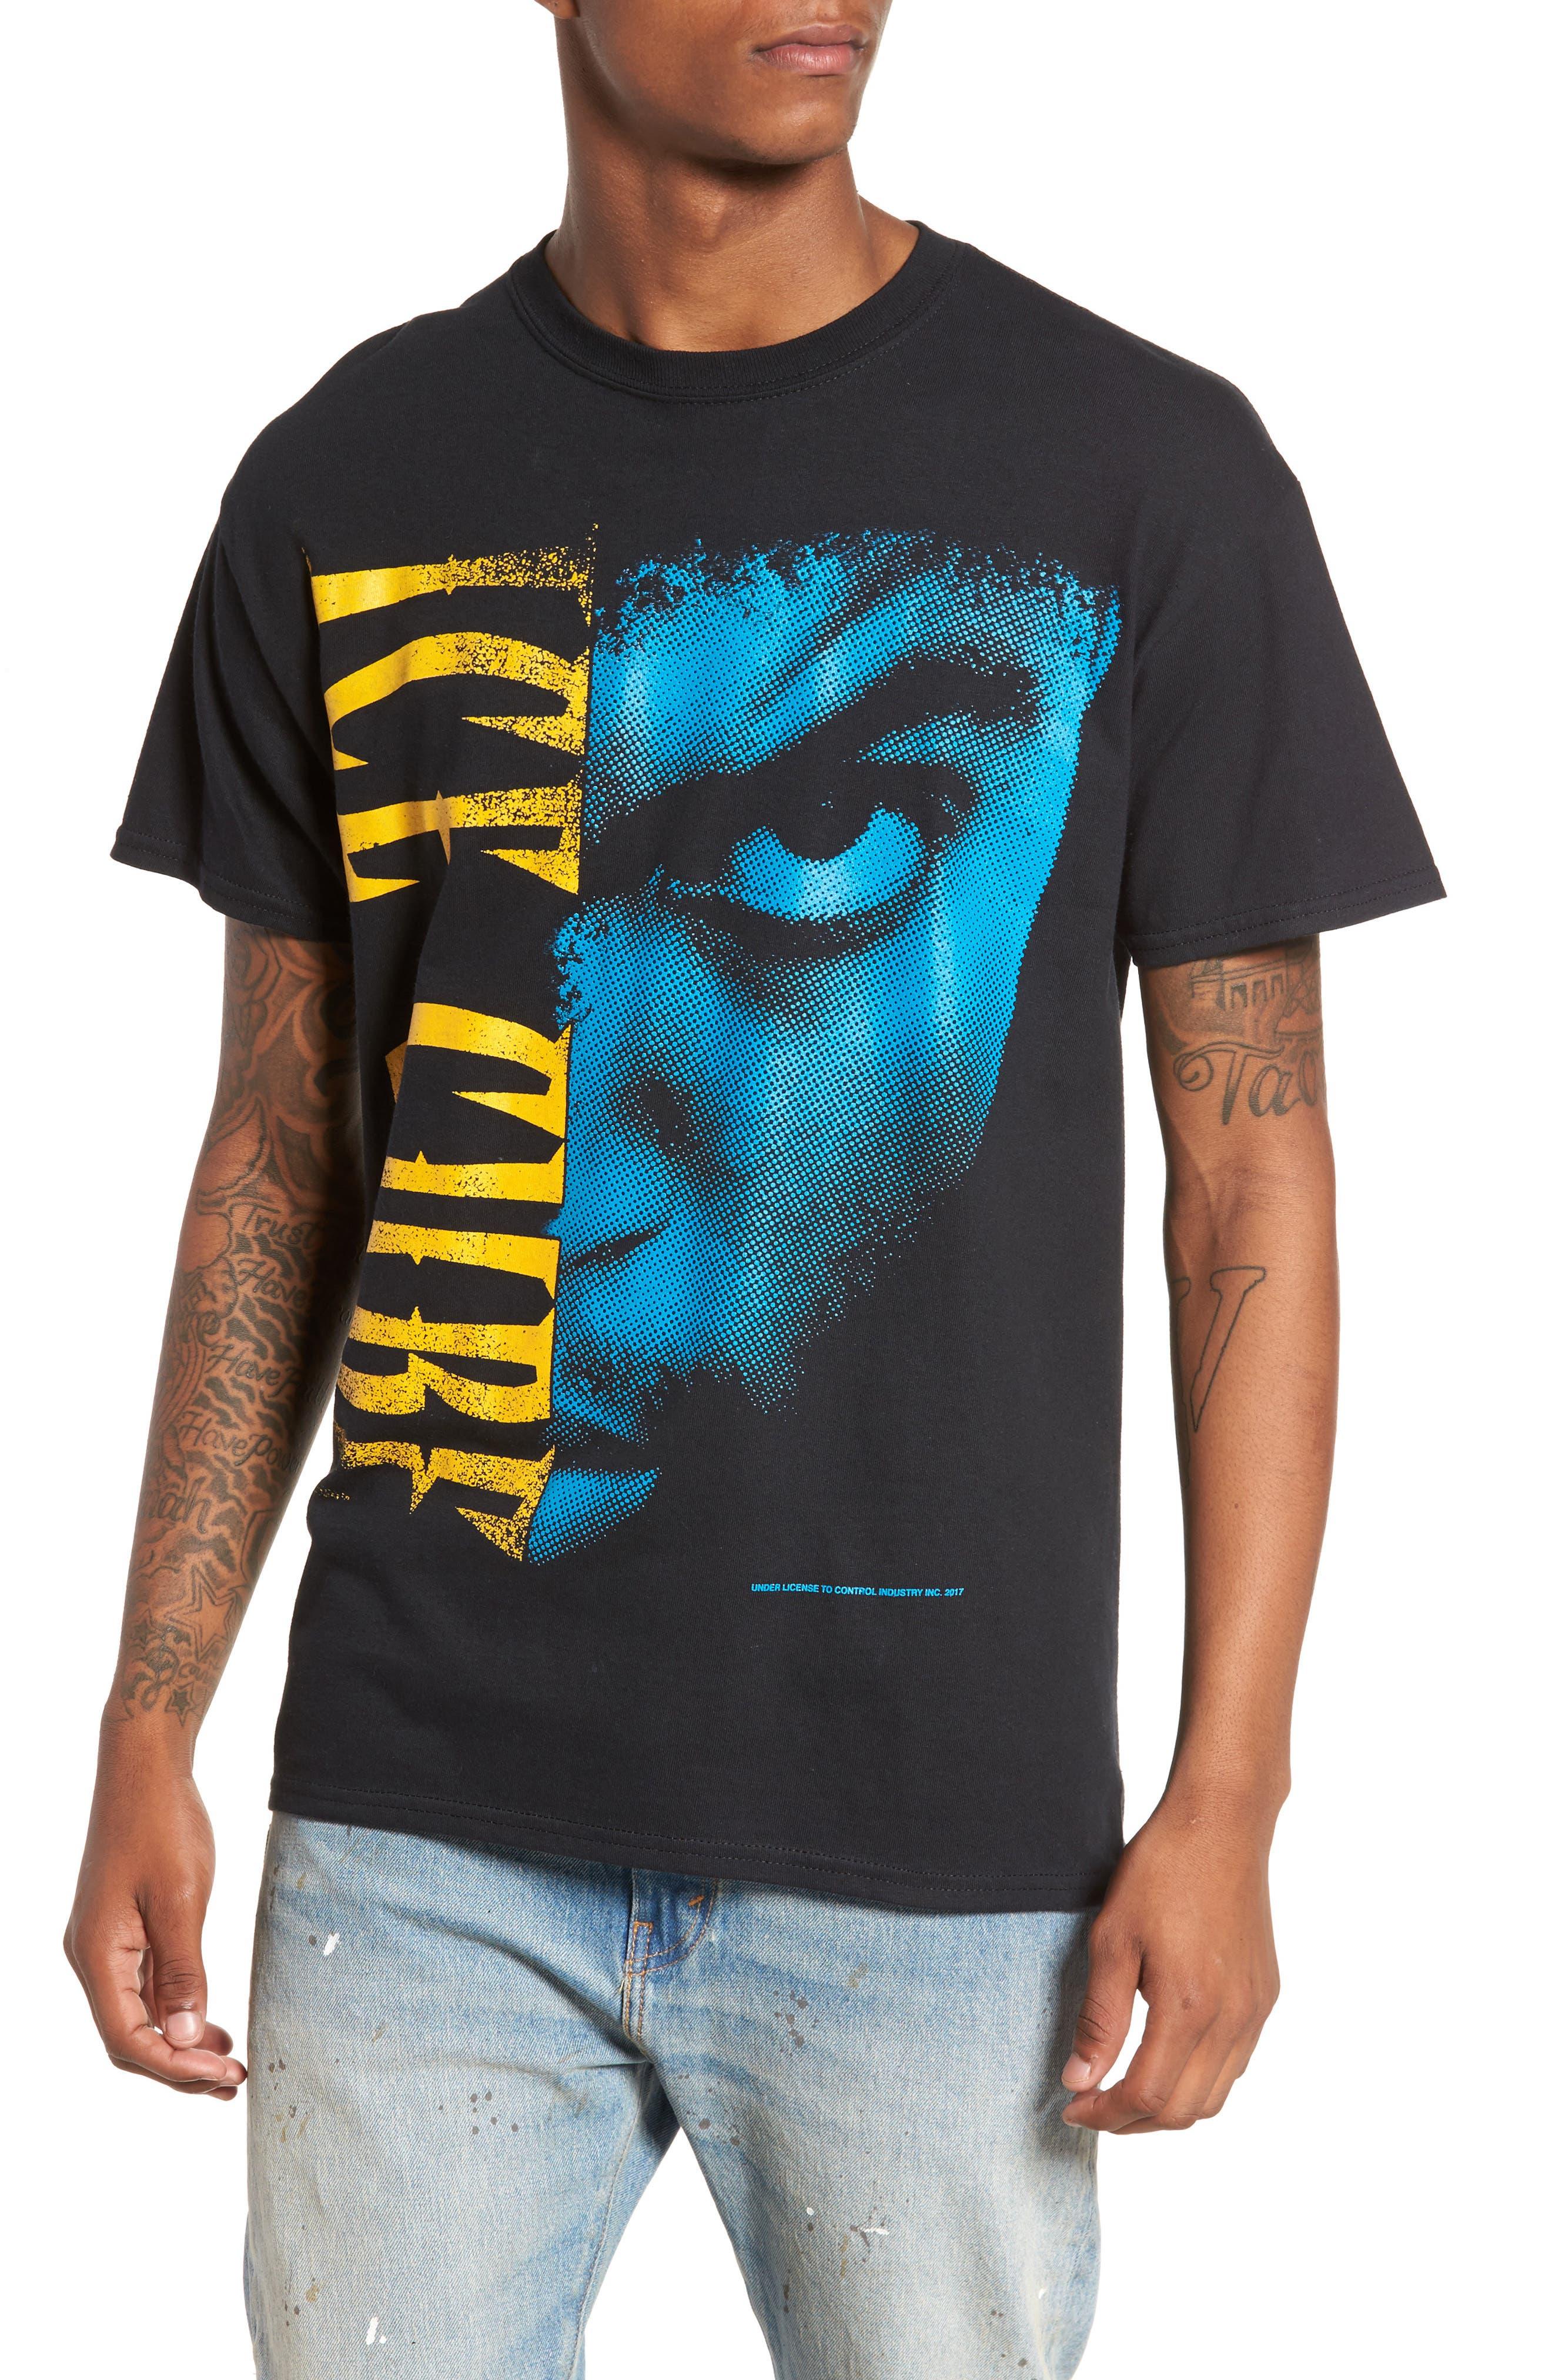 Ice Cube T-Shirt,                             Main thumbnail 1, color,                             Black Tee Ice Cube Face